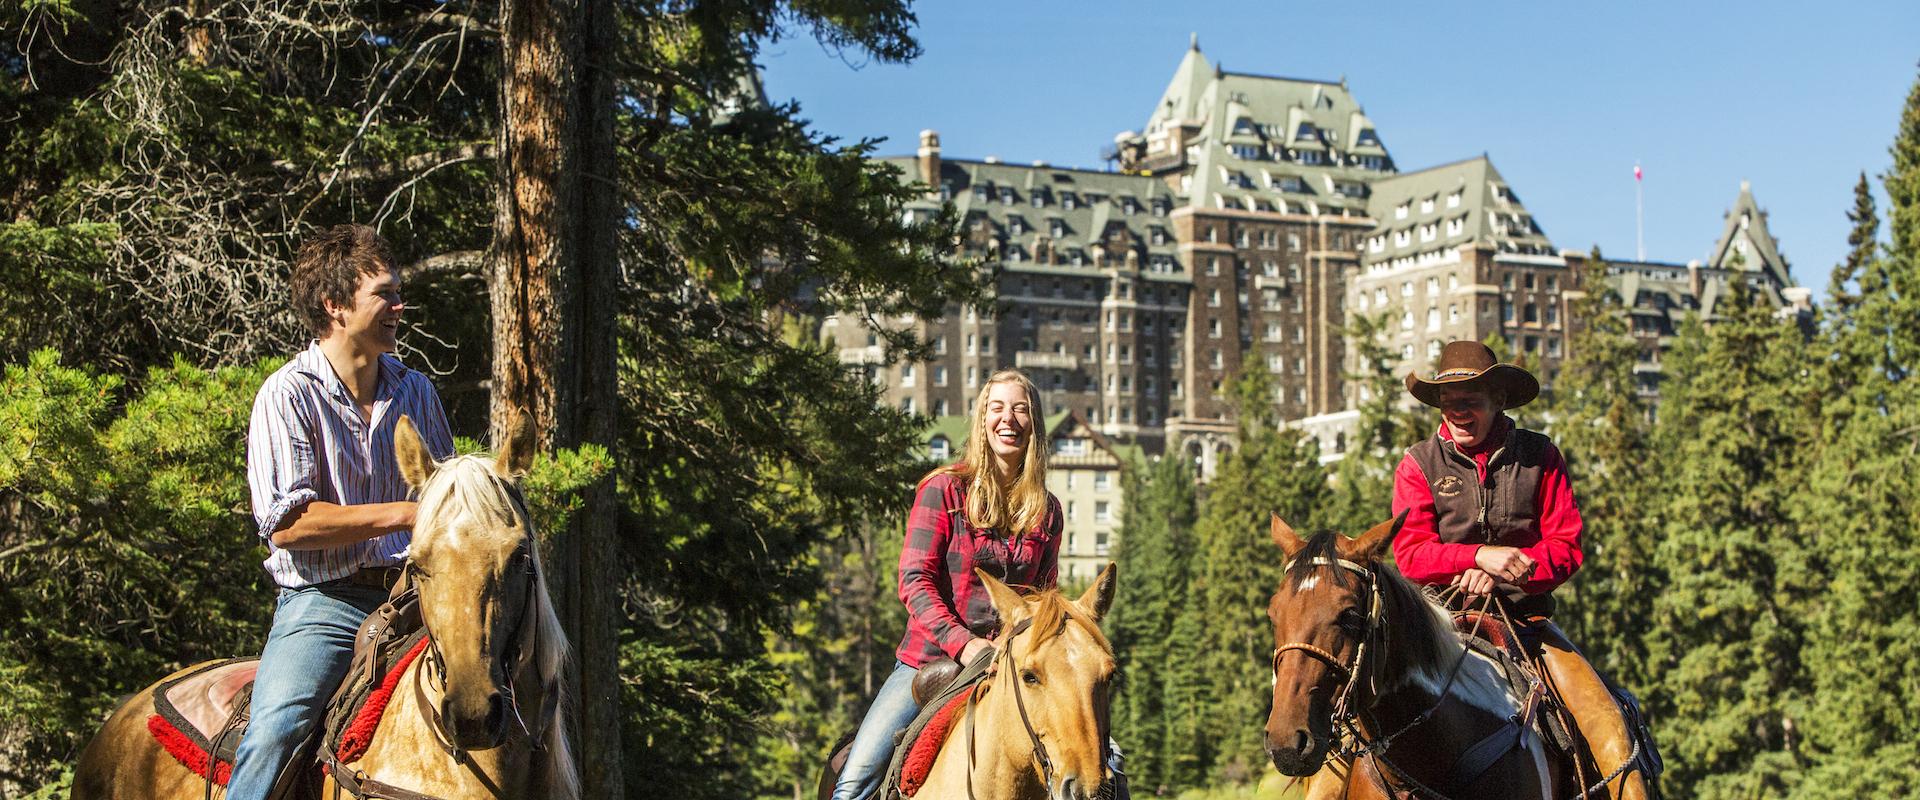 Horseback Ride near the Fairmont Banff Springs Hotel with Banff Trail Riders